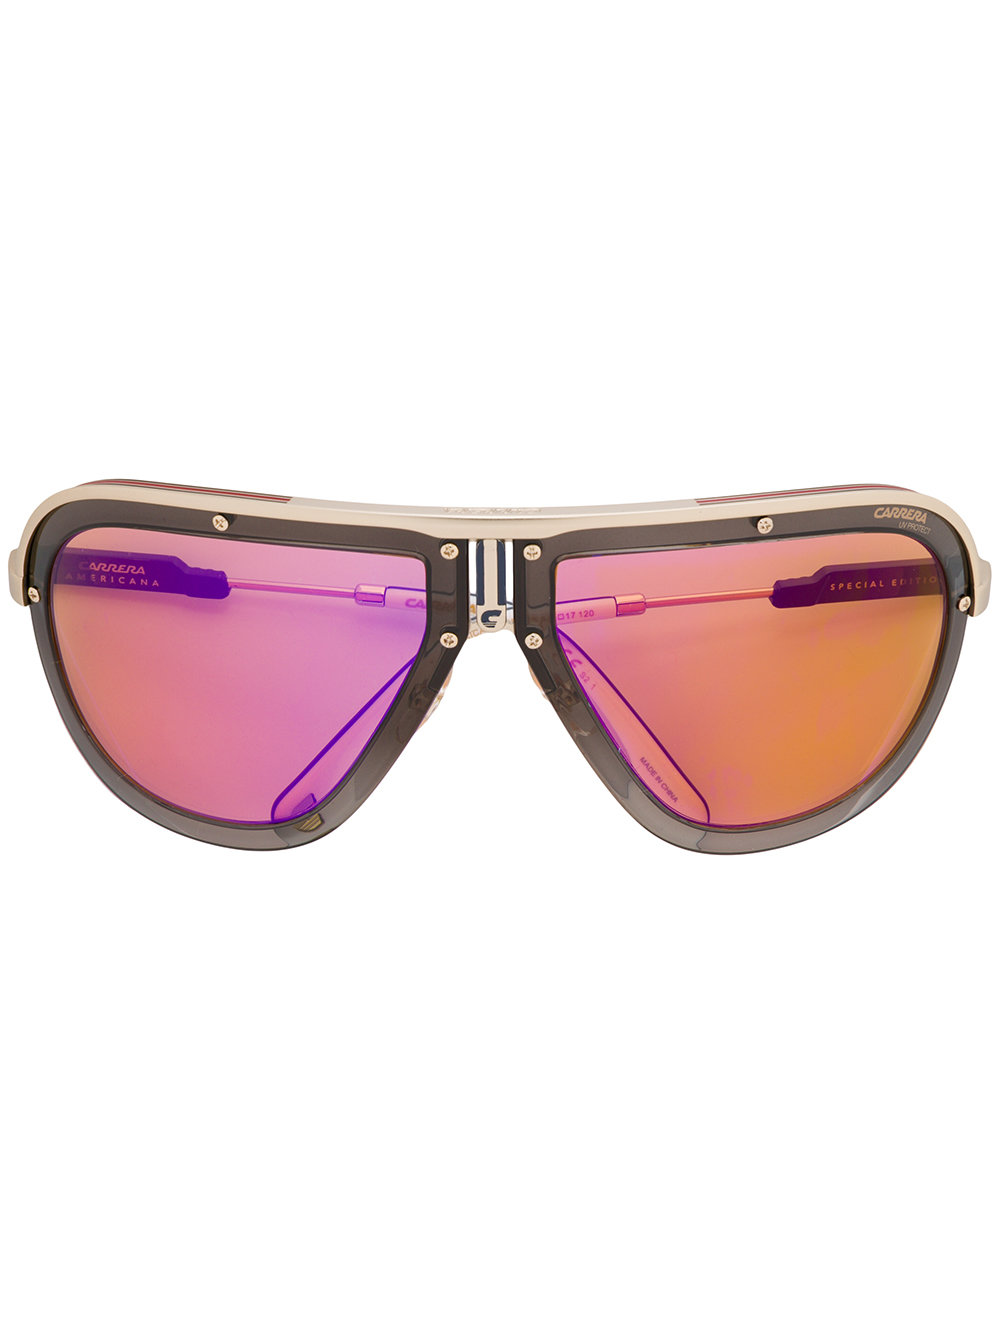 trendy sports fashion sunglasses 2018 shop online